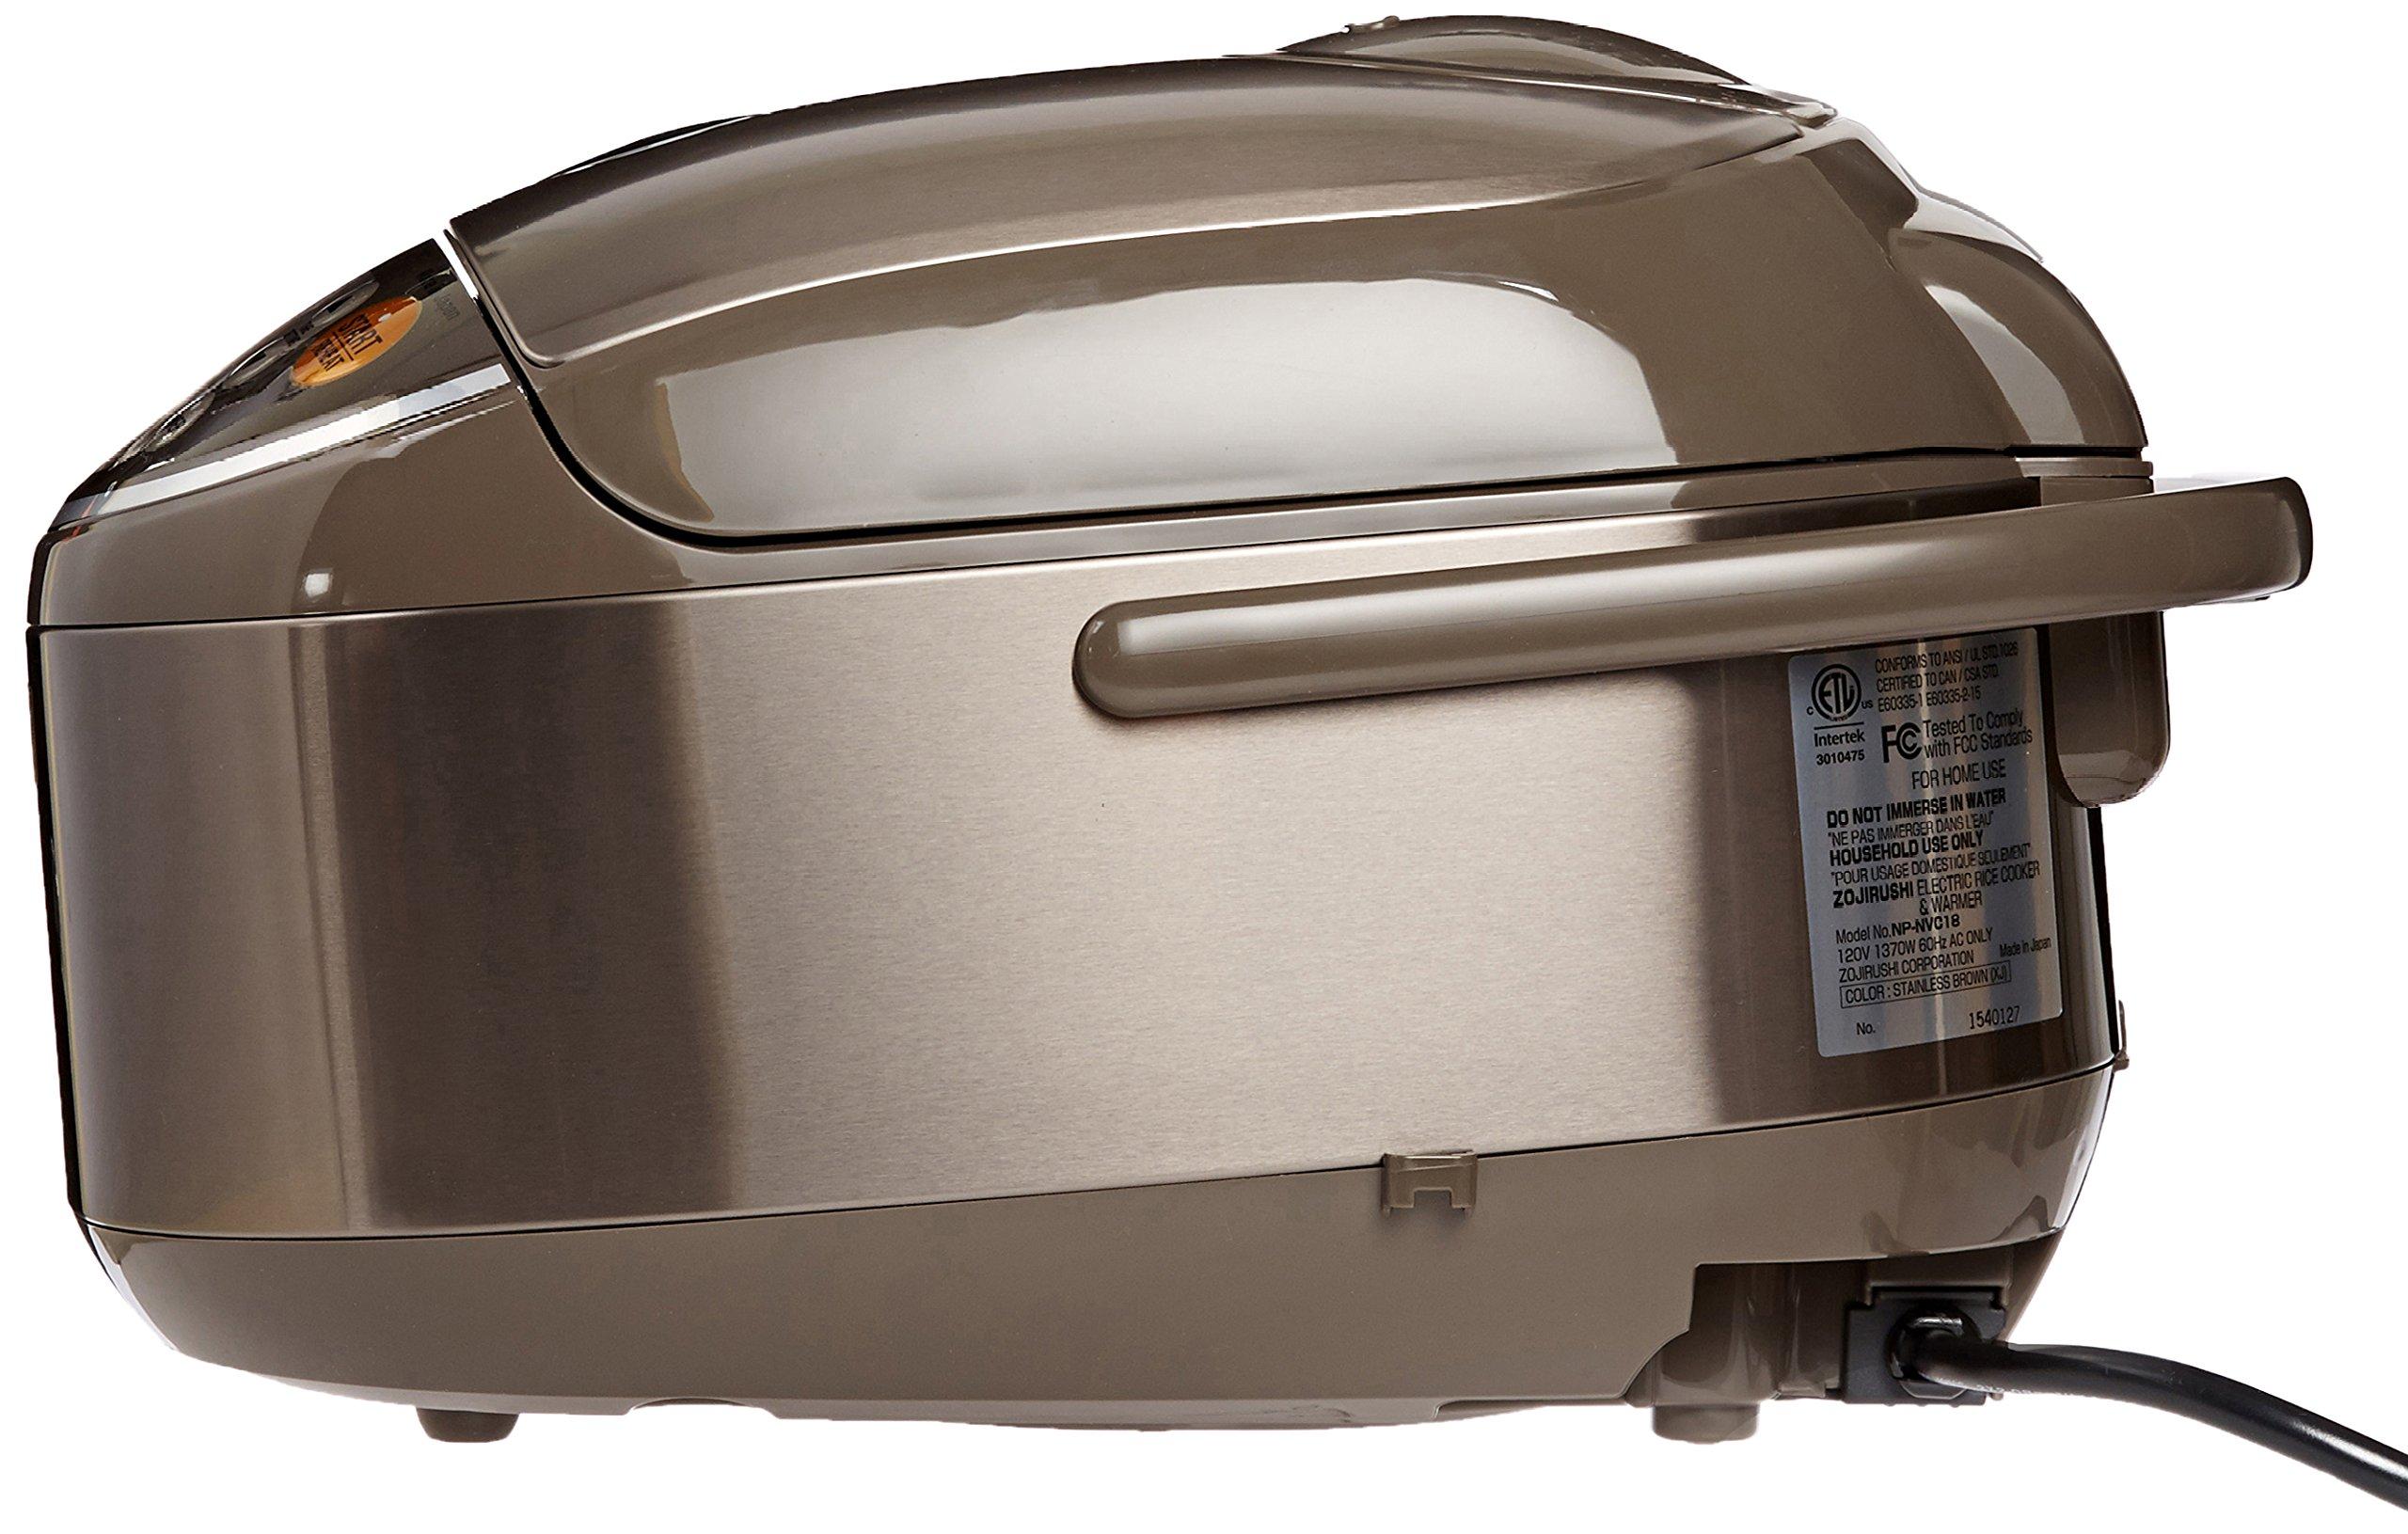 Zojirushi Induction Heating Pressure Rice Cooker & Warmer 1.8 Liter, Stainless Brown NP-NVC18 by Zojirushi (Image #3)